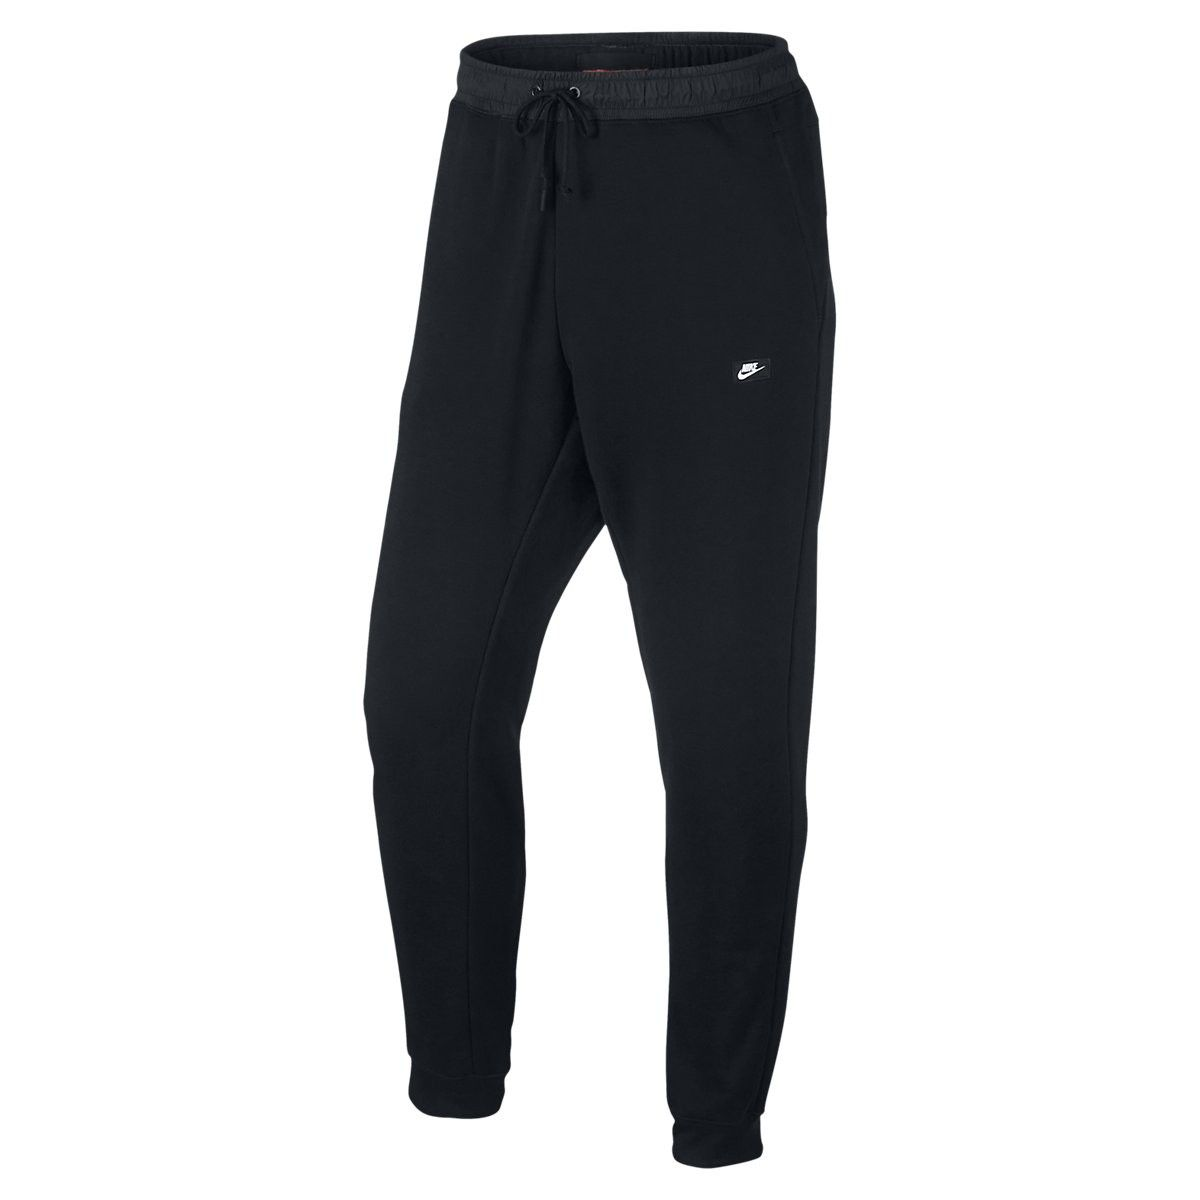 sombras de marca famosa textura clara Pantalon de survêtement Nike Sportswear Modern Jogger - 805154-010